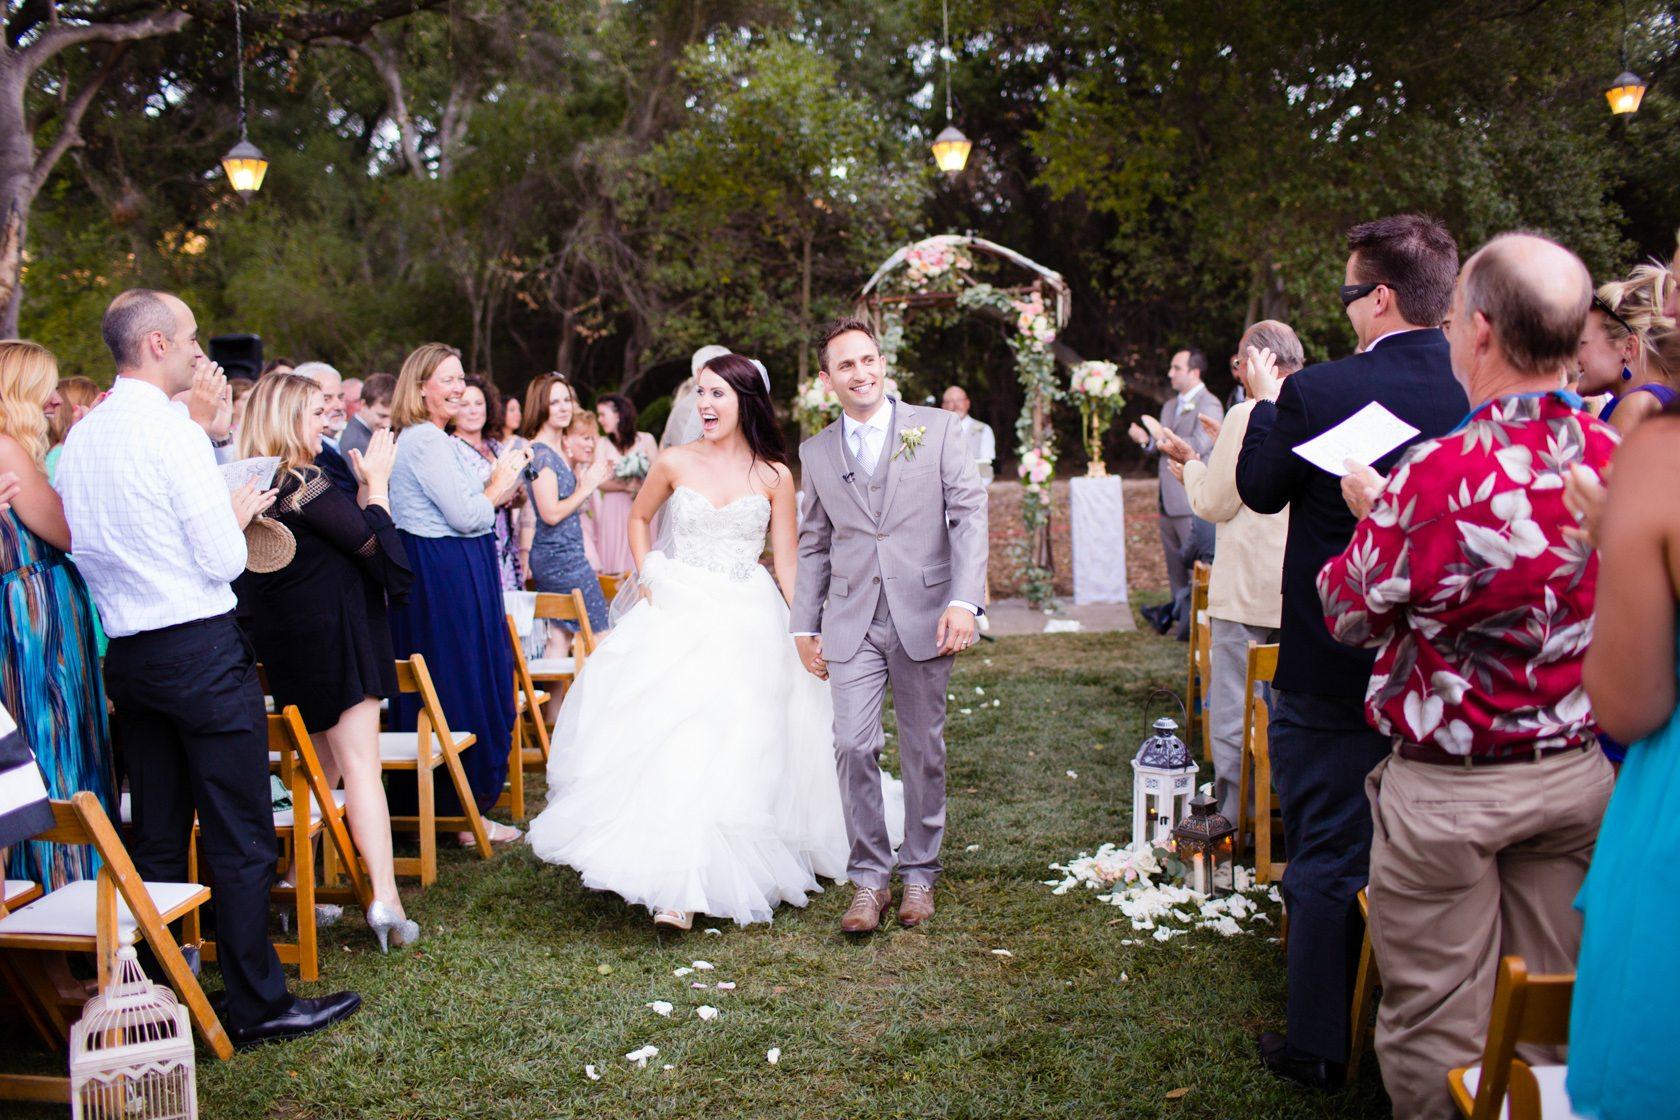 Temecula_Creek_Inn_Wedding_104.jpg